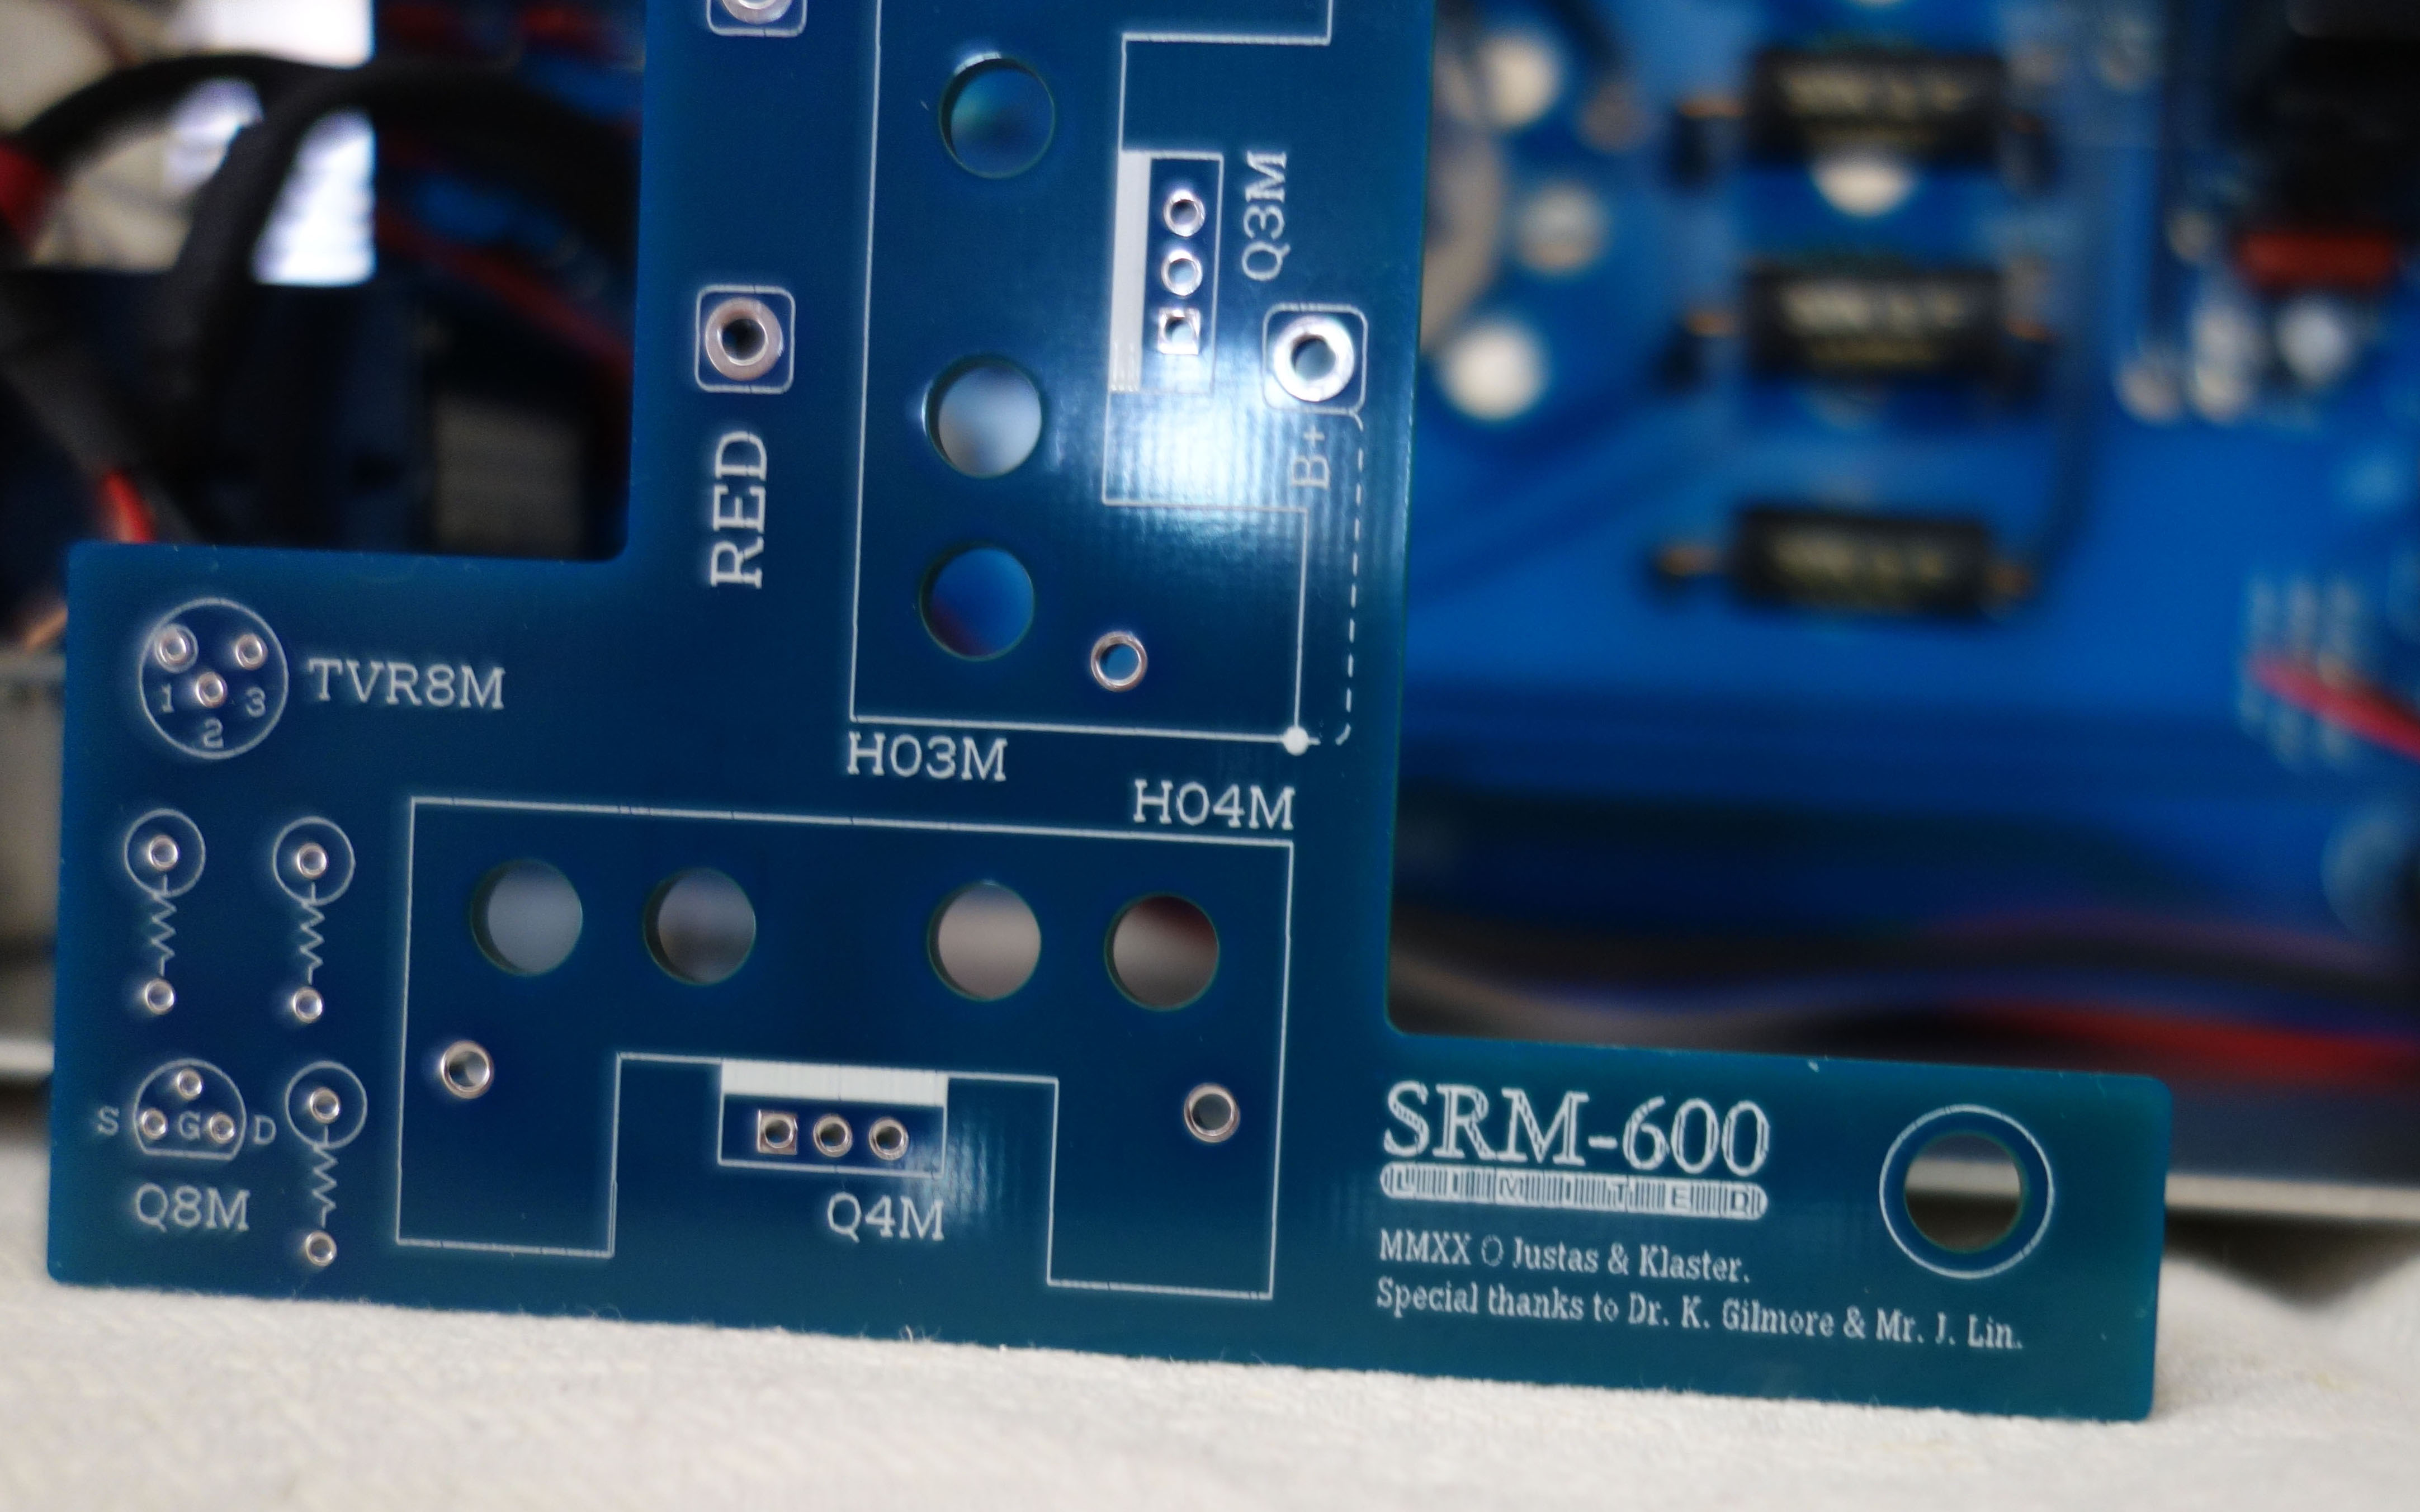 DSC03654-2.JPG